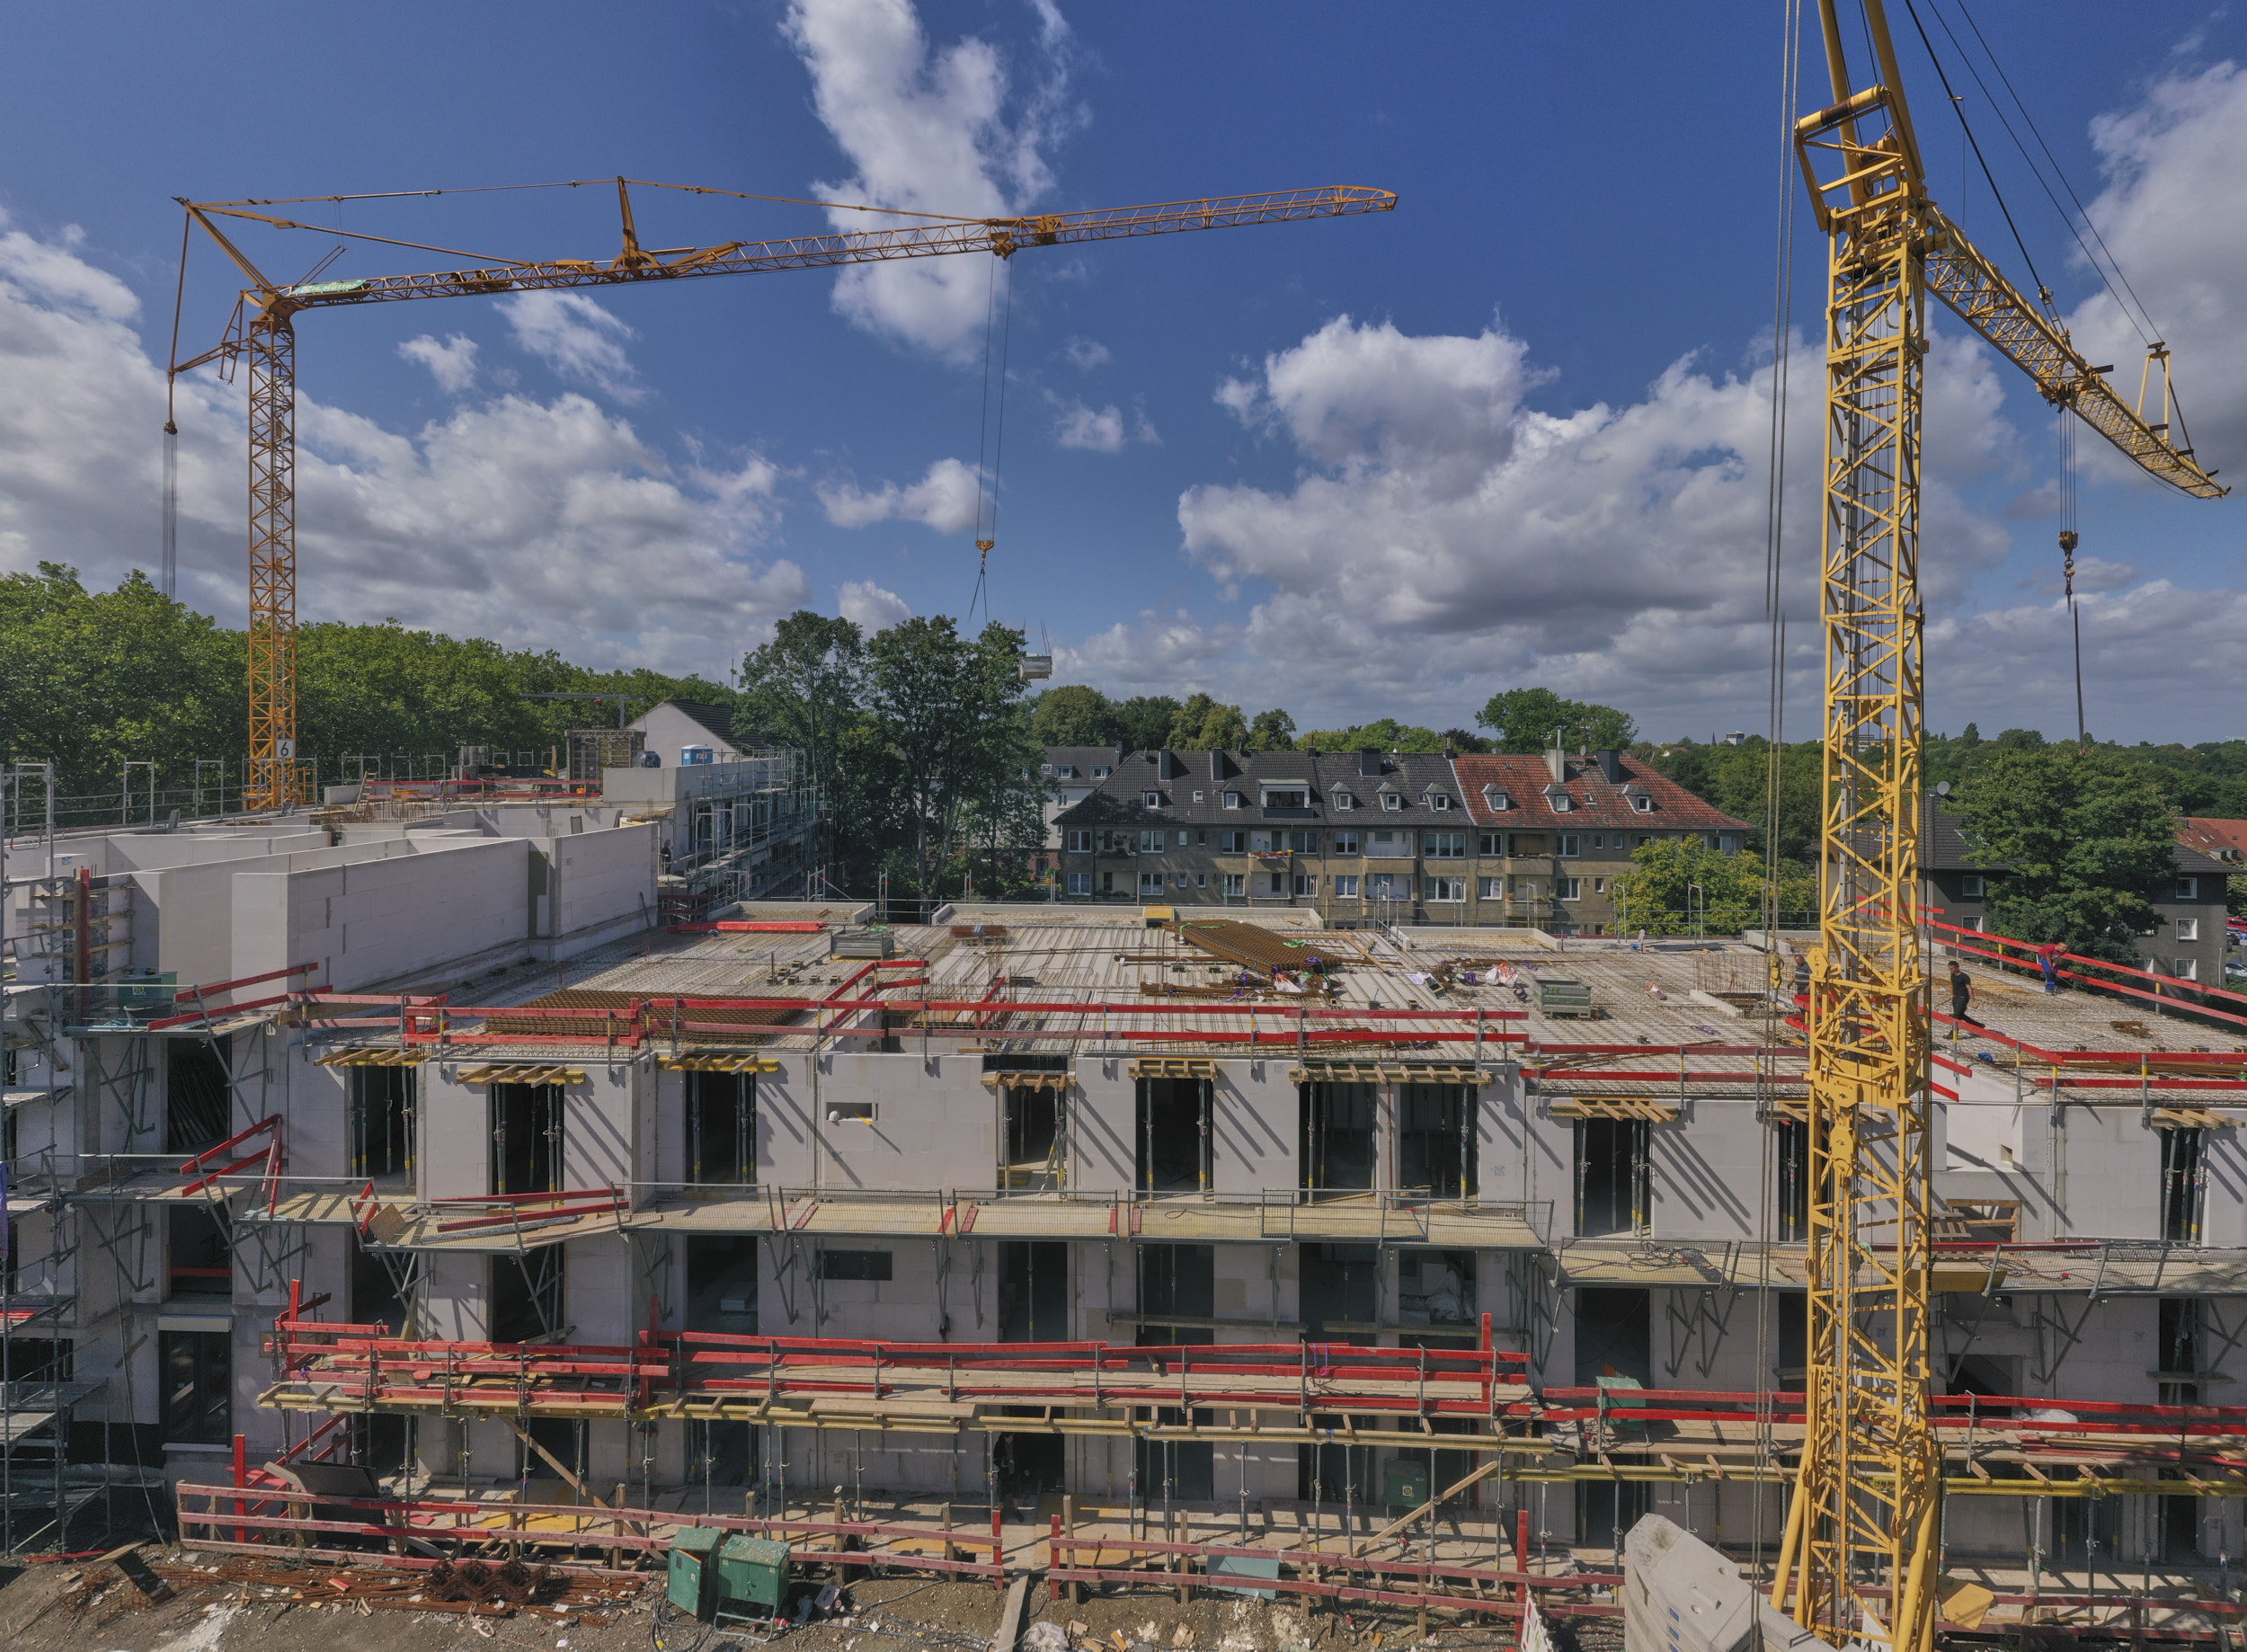 Baustelle am 8. September als 360° Panoramatour